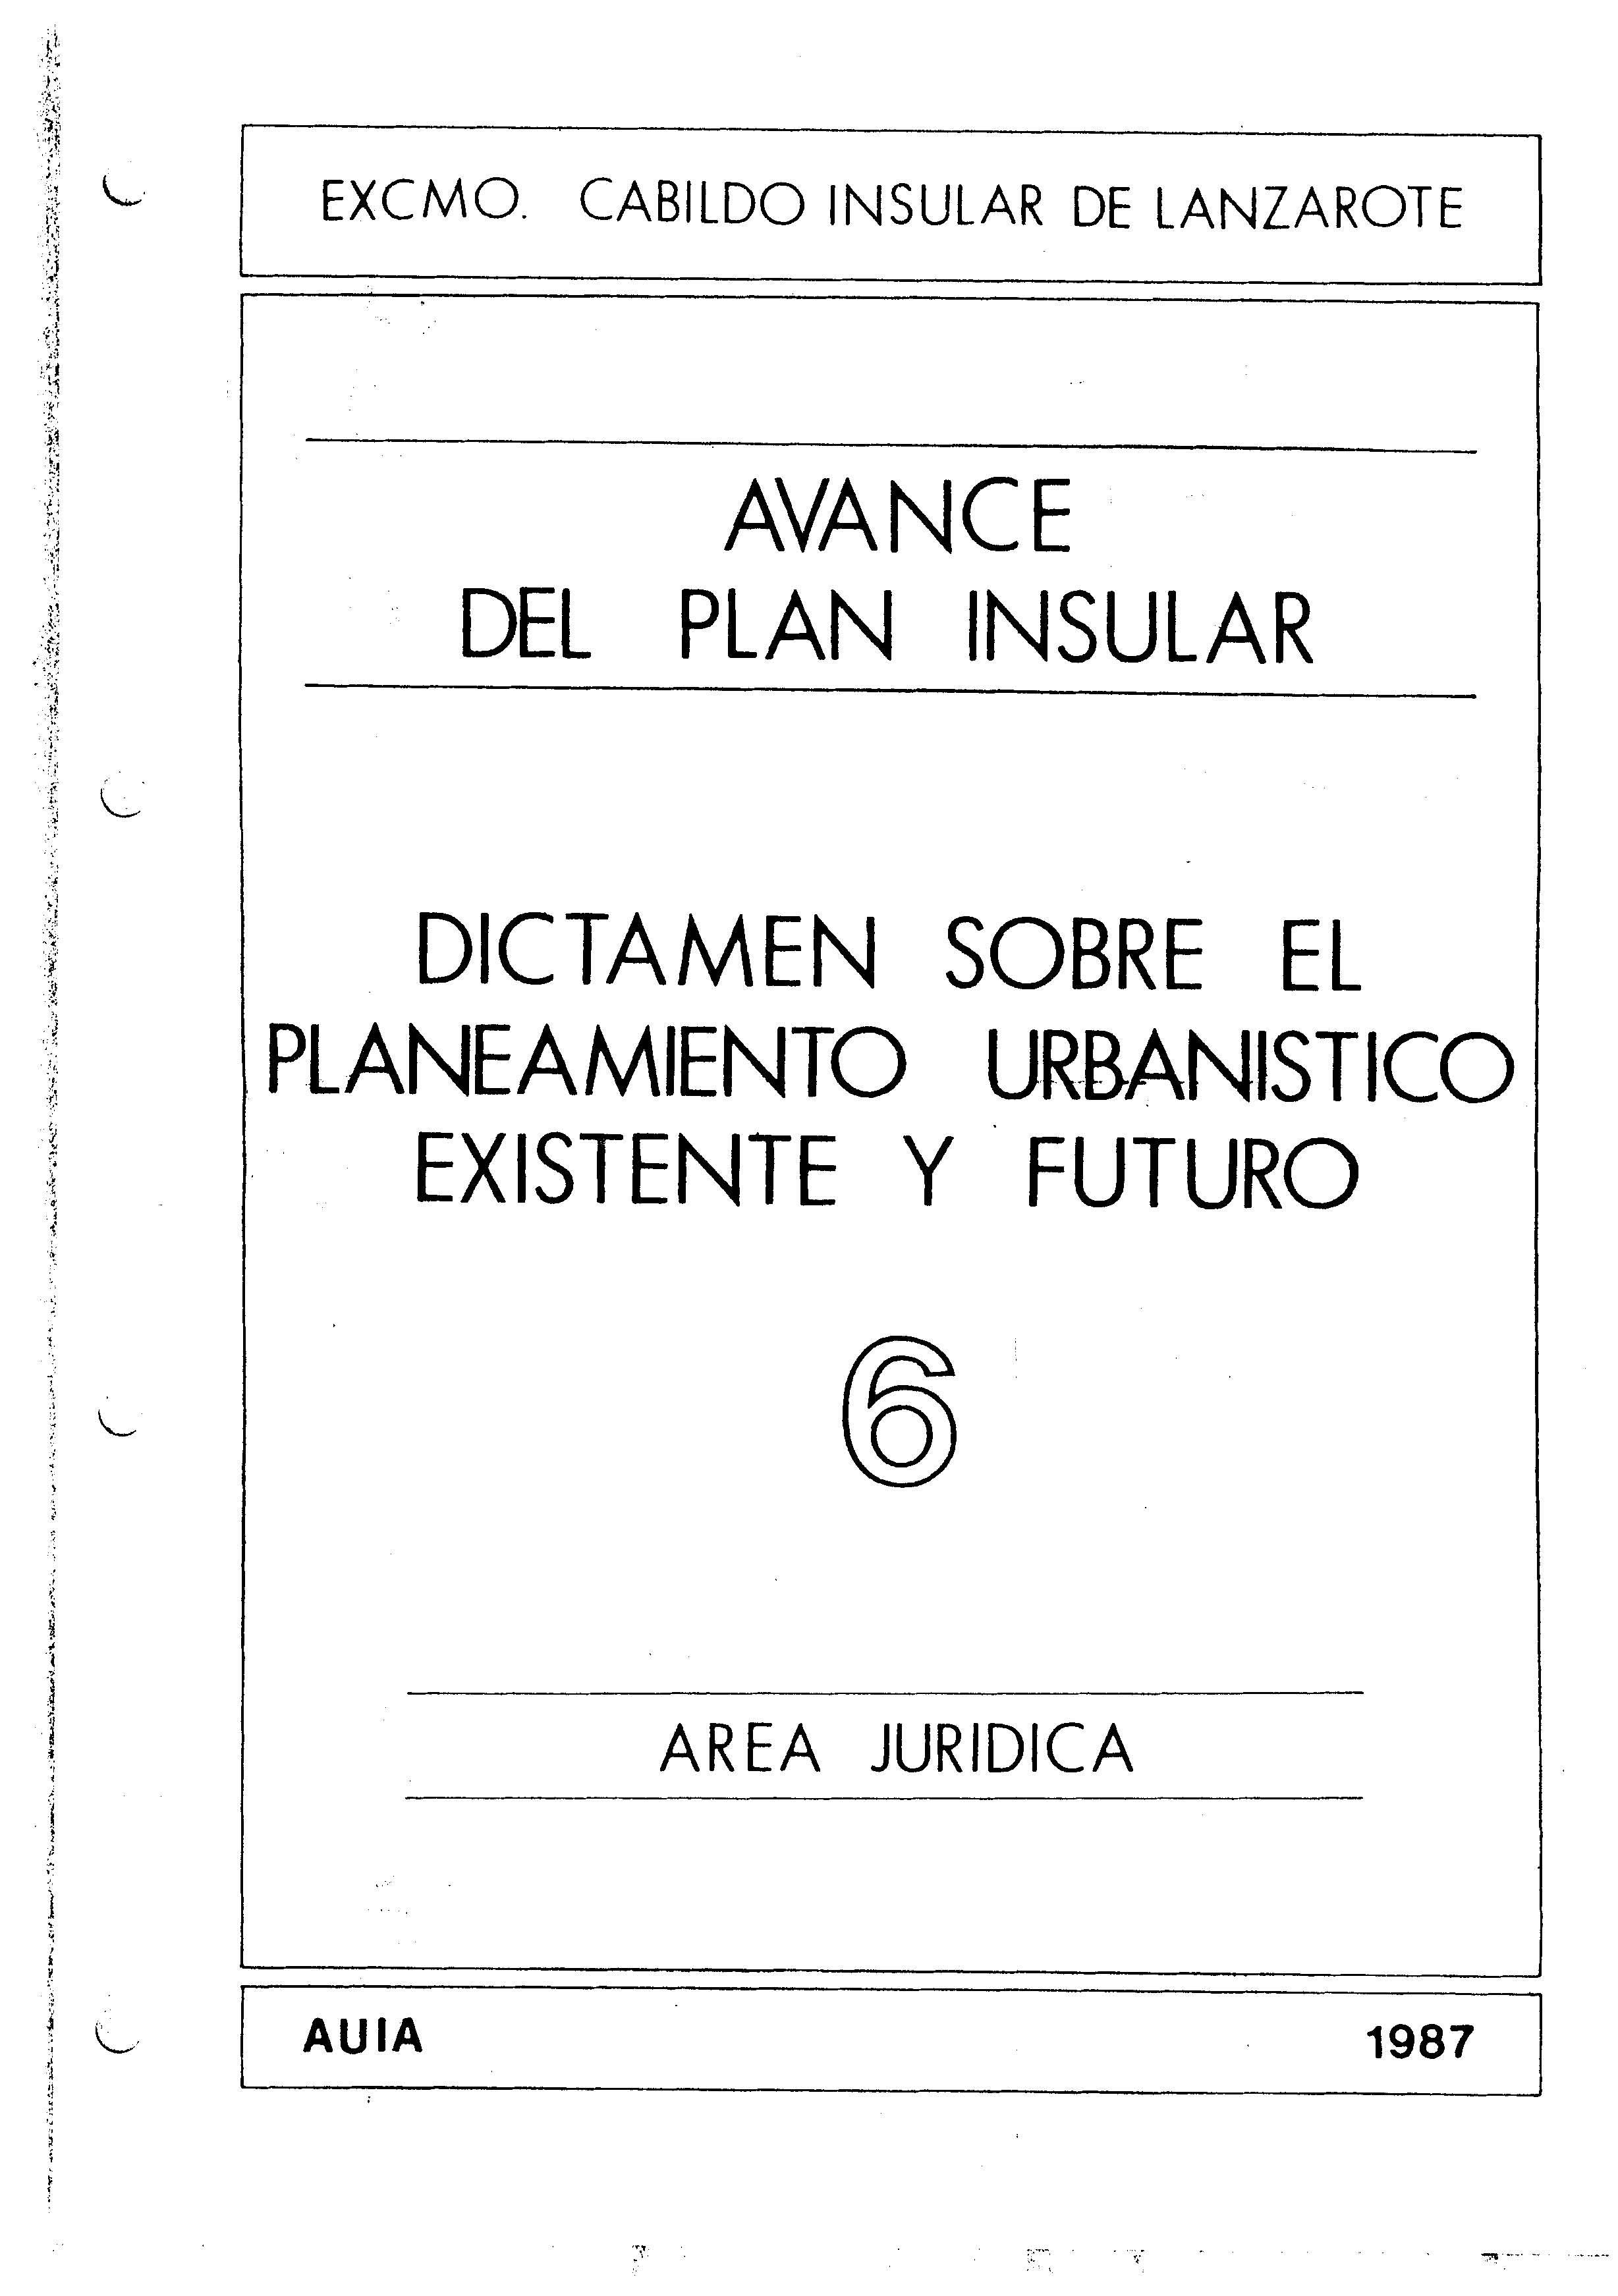 Tomo 6. Área Jurídica. Avance Plan Insular (1987)